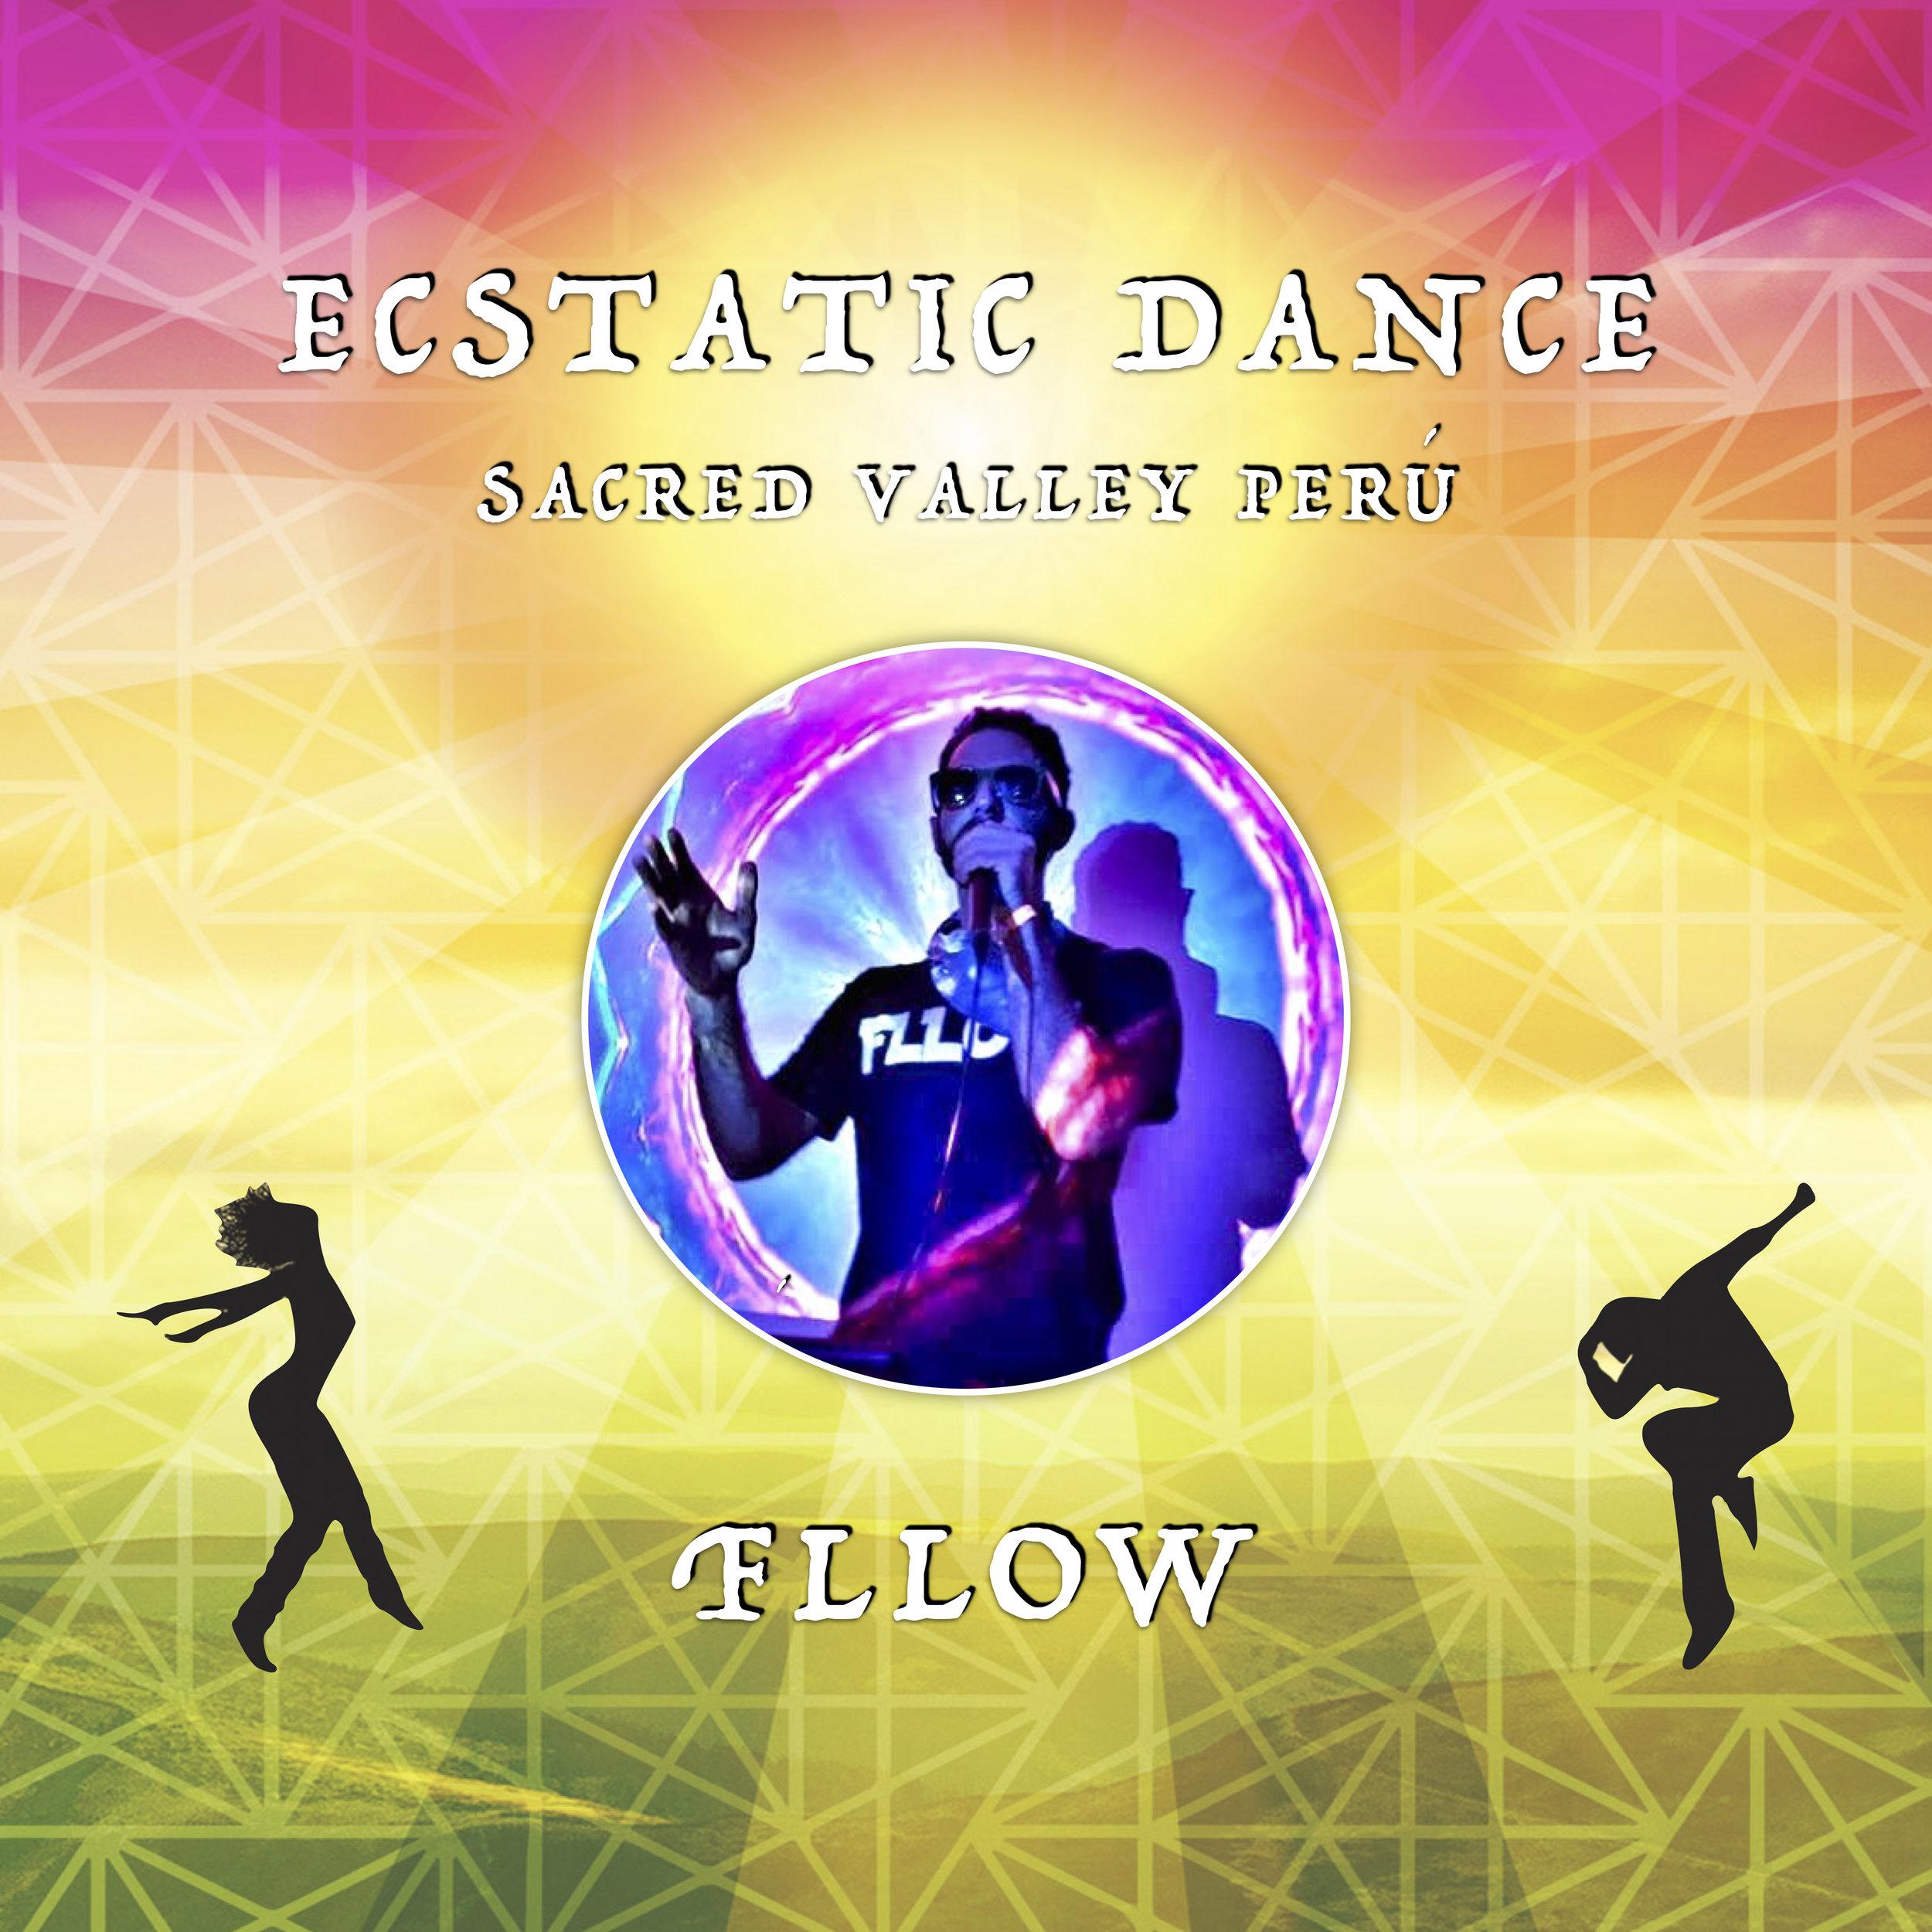 DJ FLLOW - ECSTATIC DANCE SCARED VALLEY PERU MEDICINE.jpg